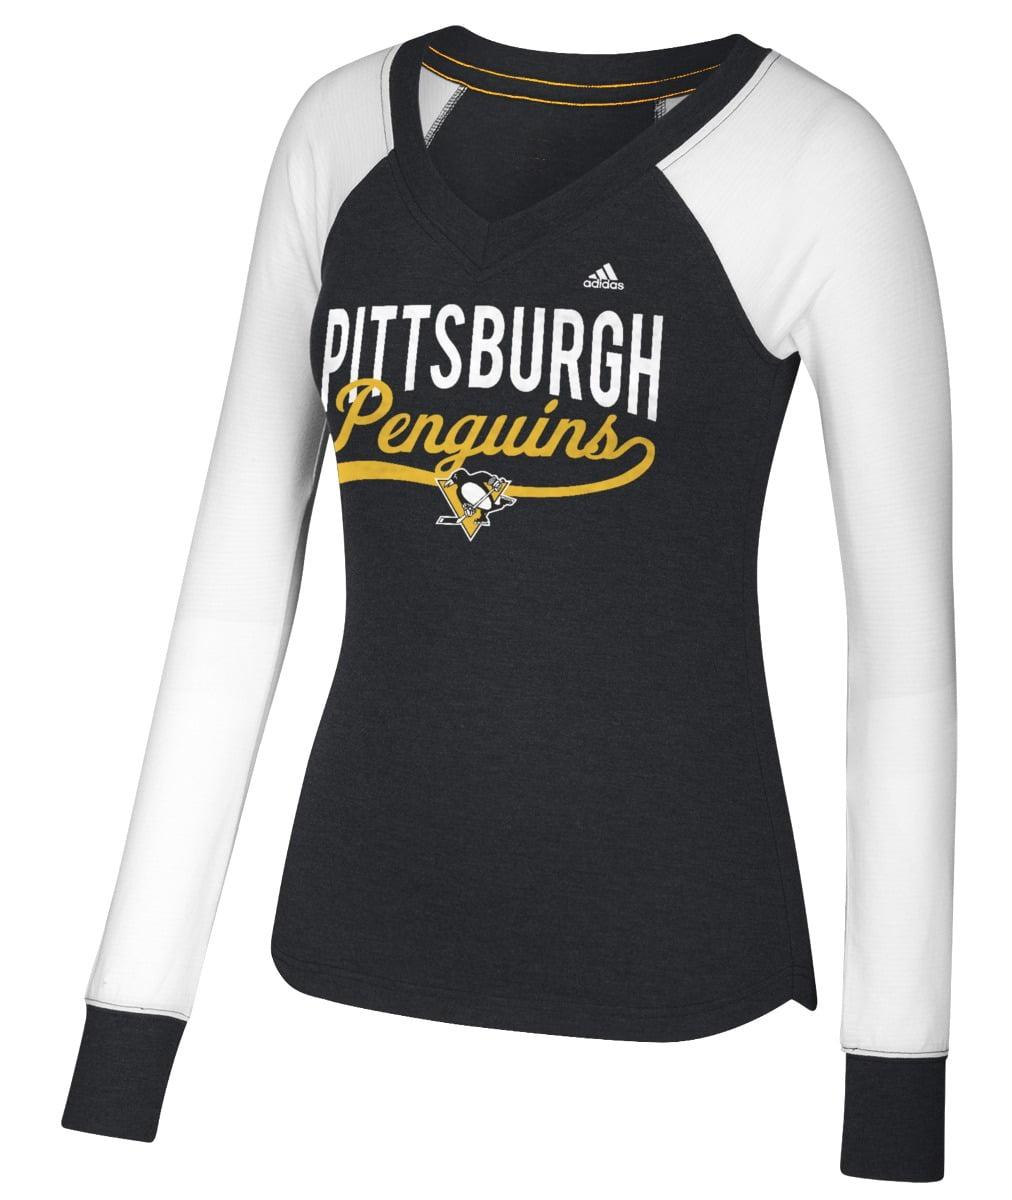 Pittsburgh Penguins Women's Adidas NHL Puck Drop Dual Blend Long Sleeve T-shirt by Adidas